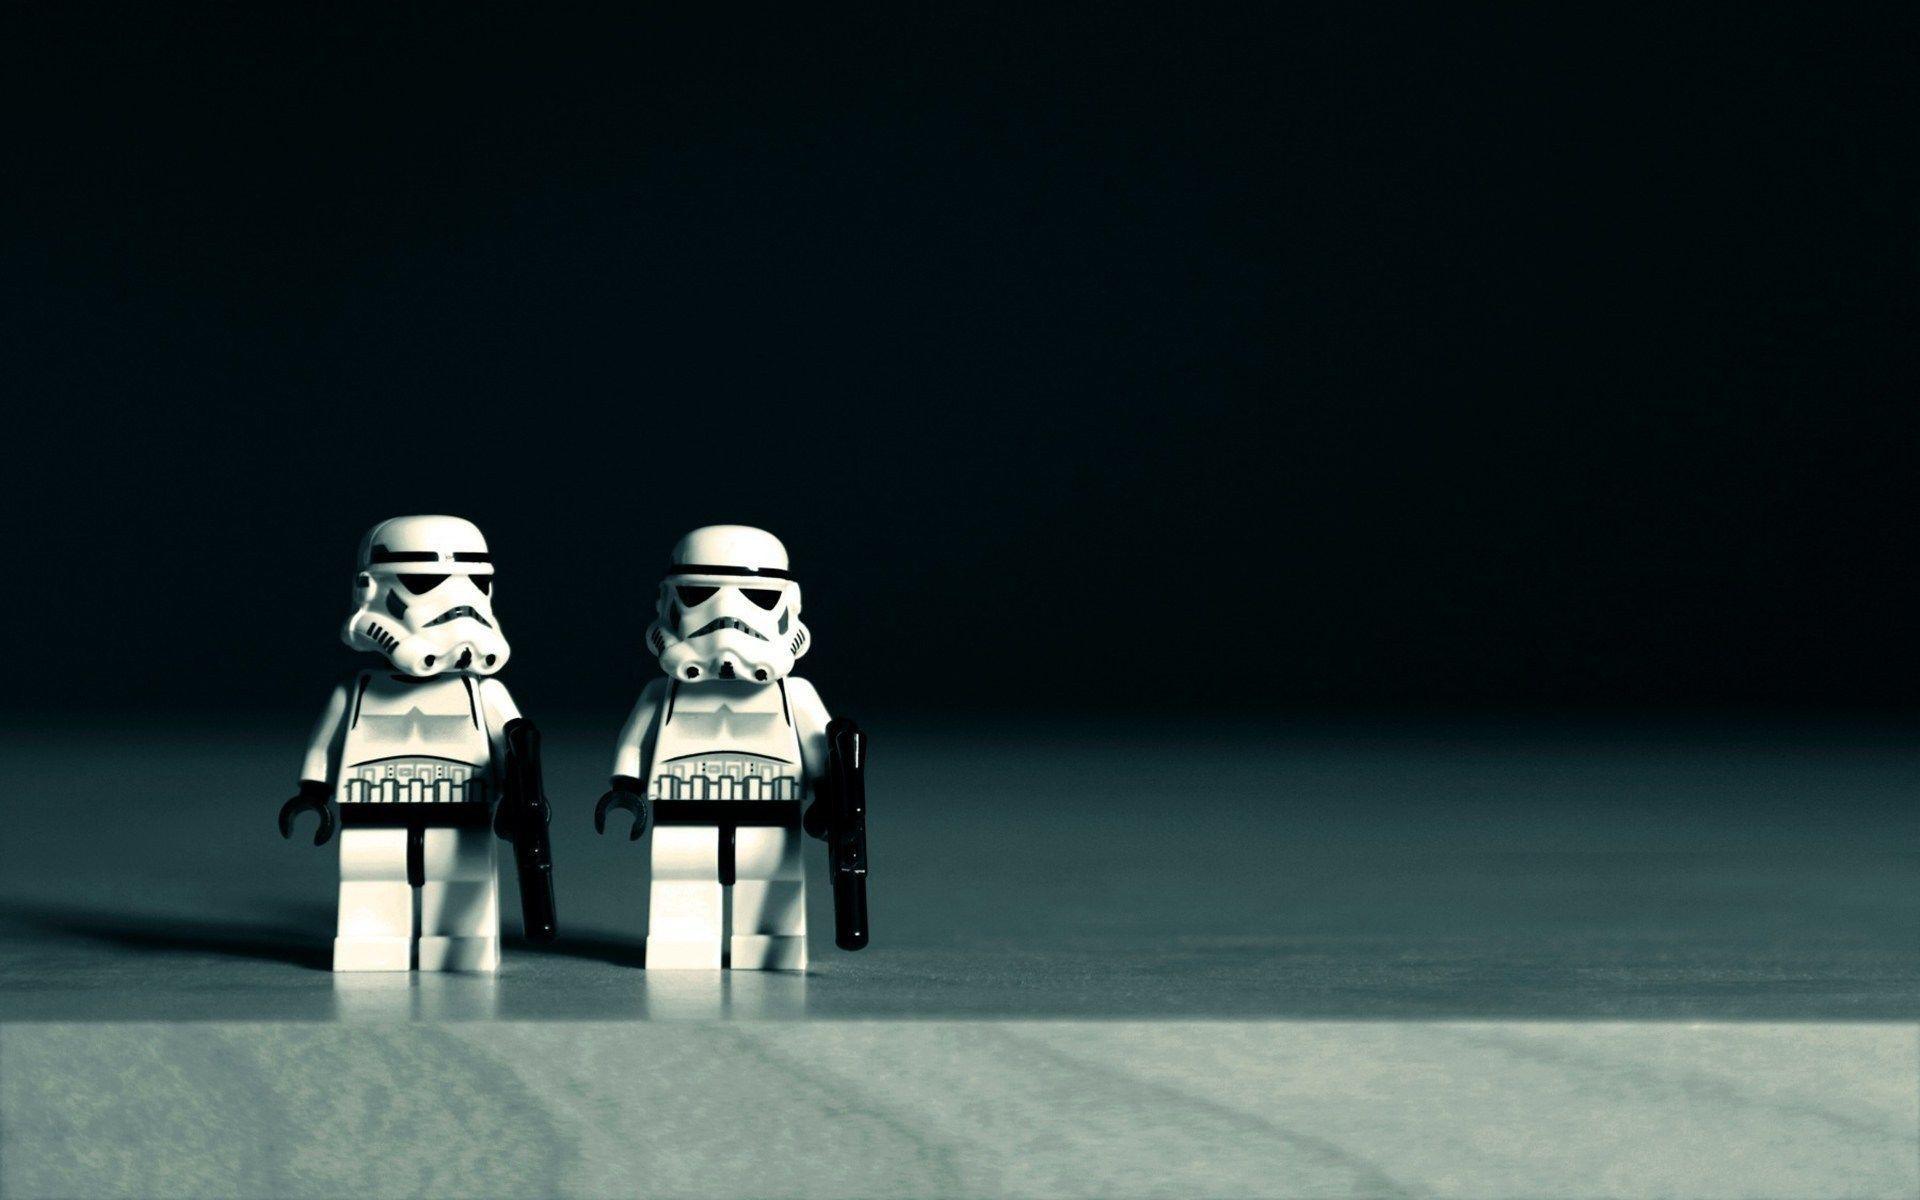 Star Wars Stormtrooper Wallpapers 1920x1200